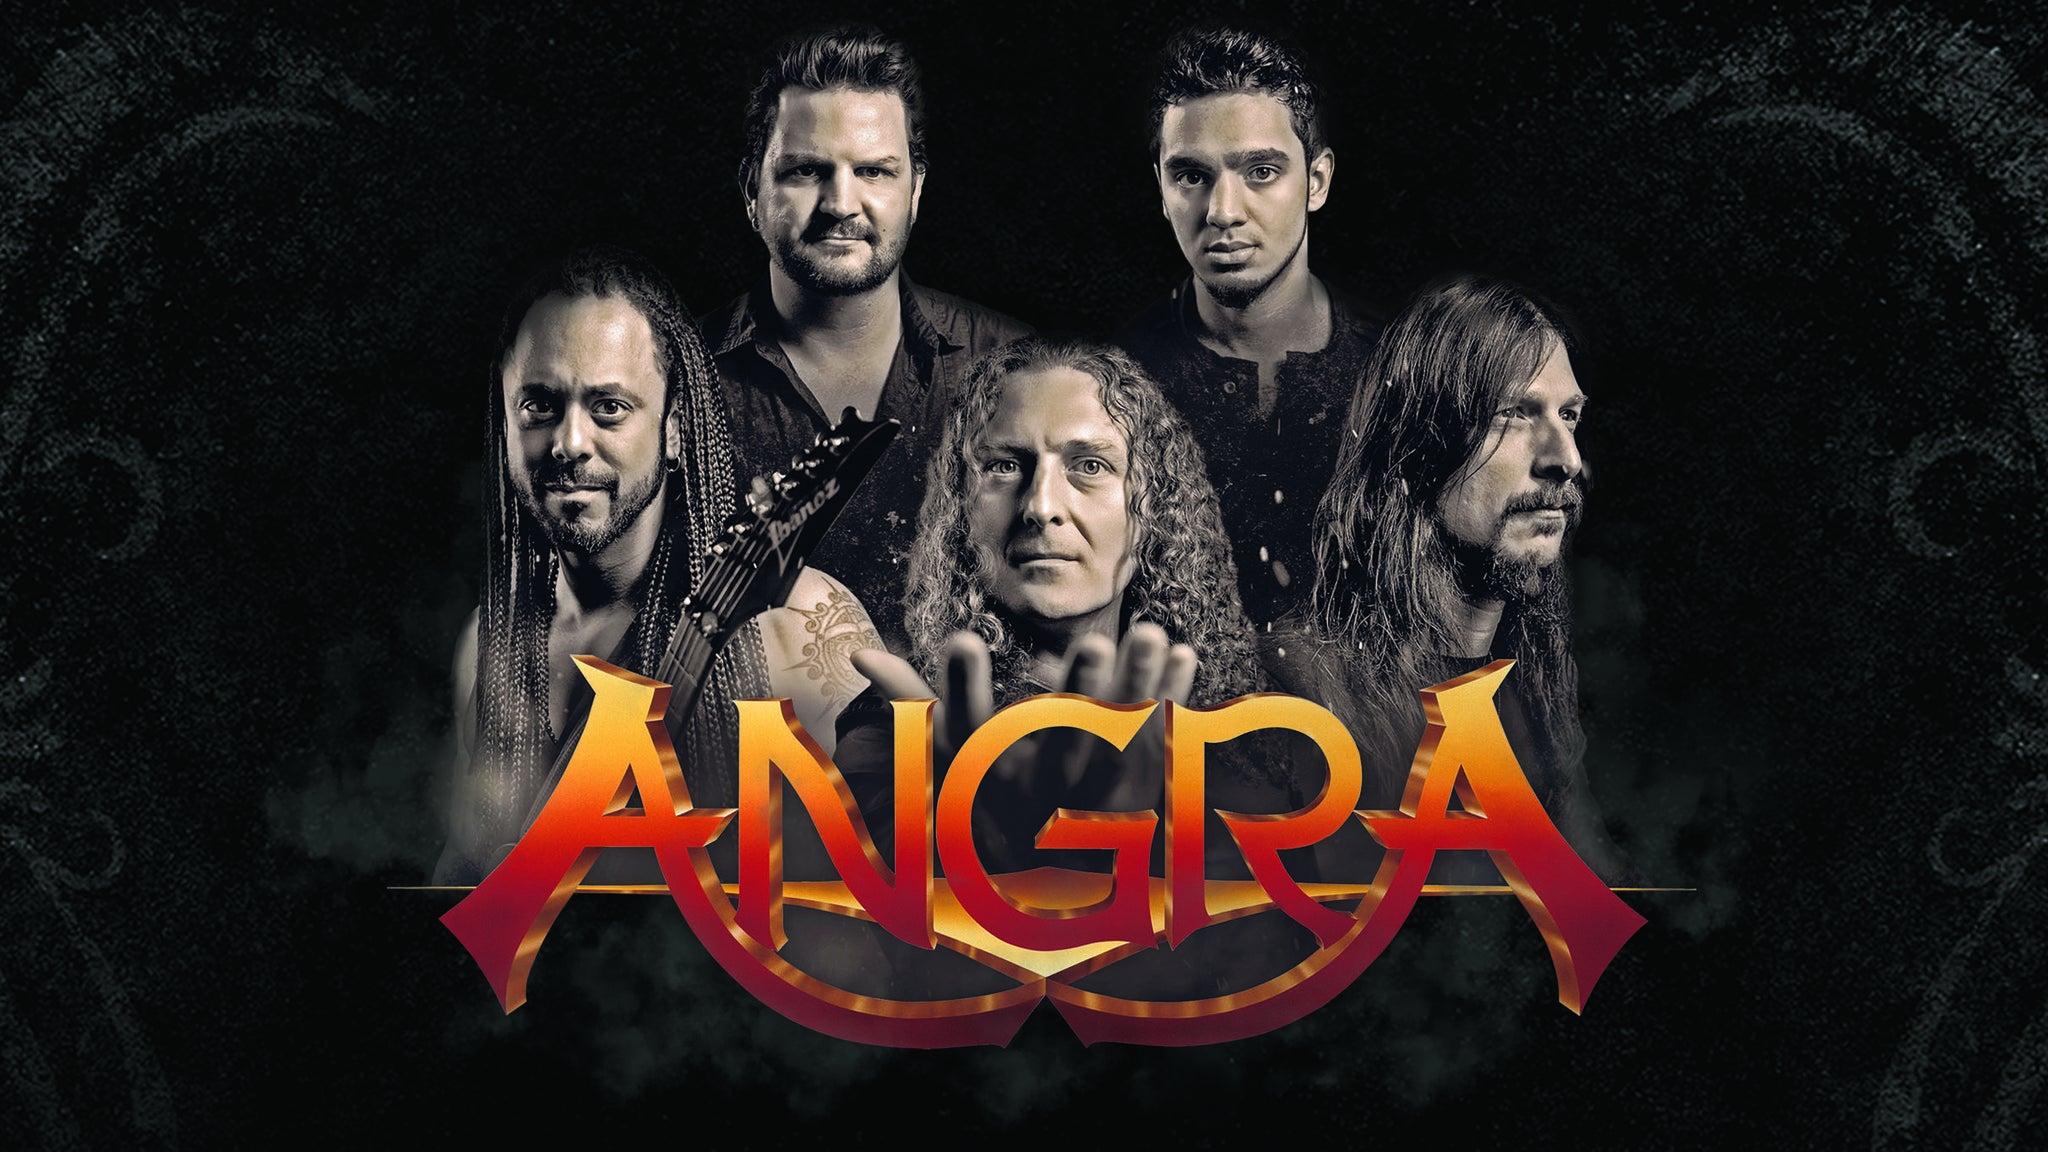 Angra at Diamond Pub Concert Hall